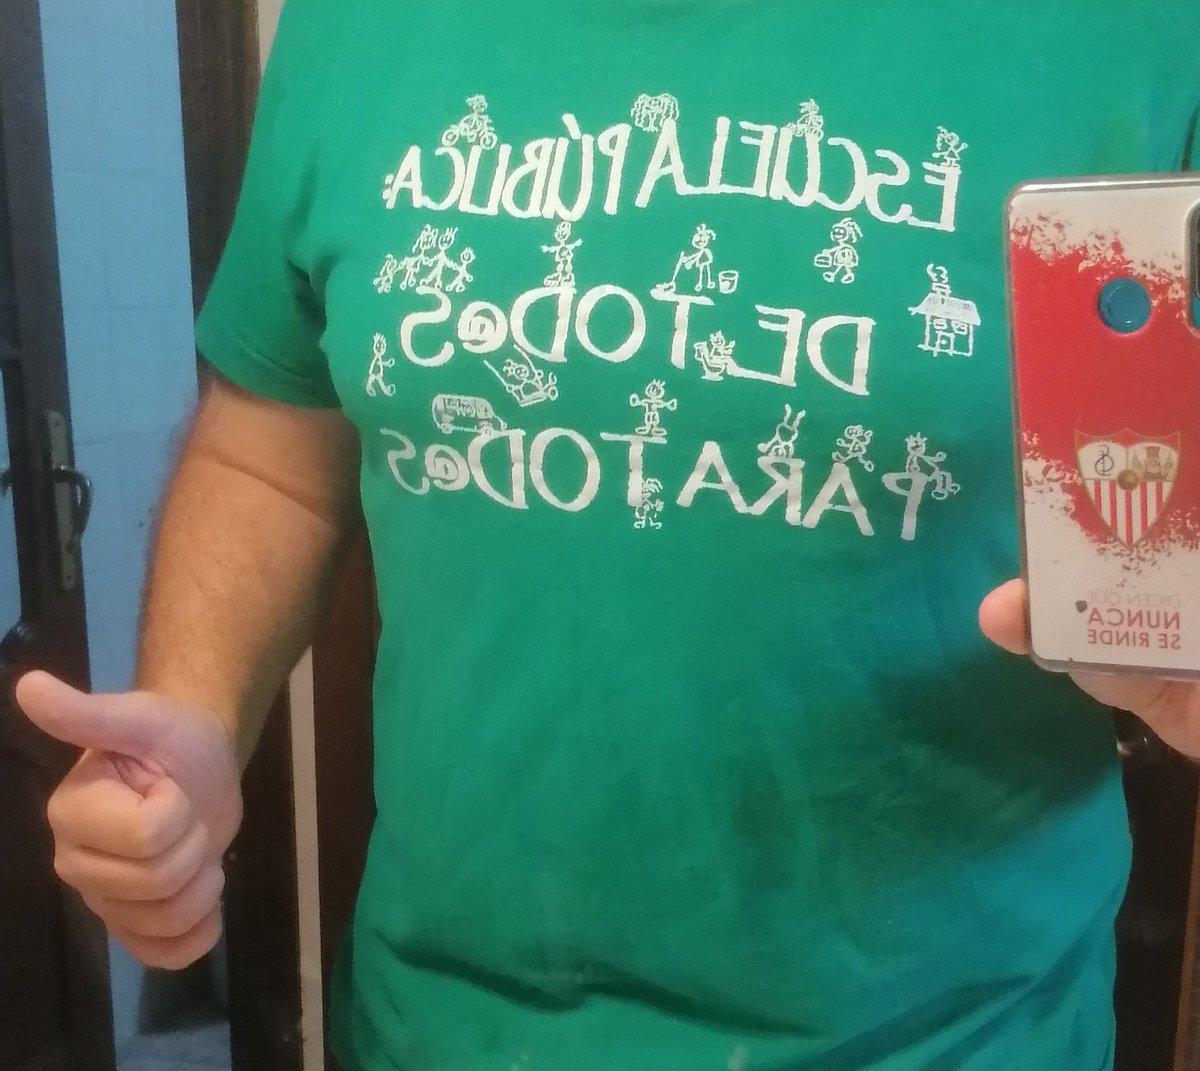 Hoy vuelve a tocar sacar esta camiseta de  👨🏼🏫#Huelgaeducativa18S 🏫Escuela públi....